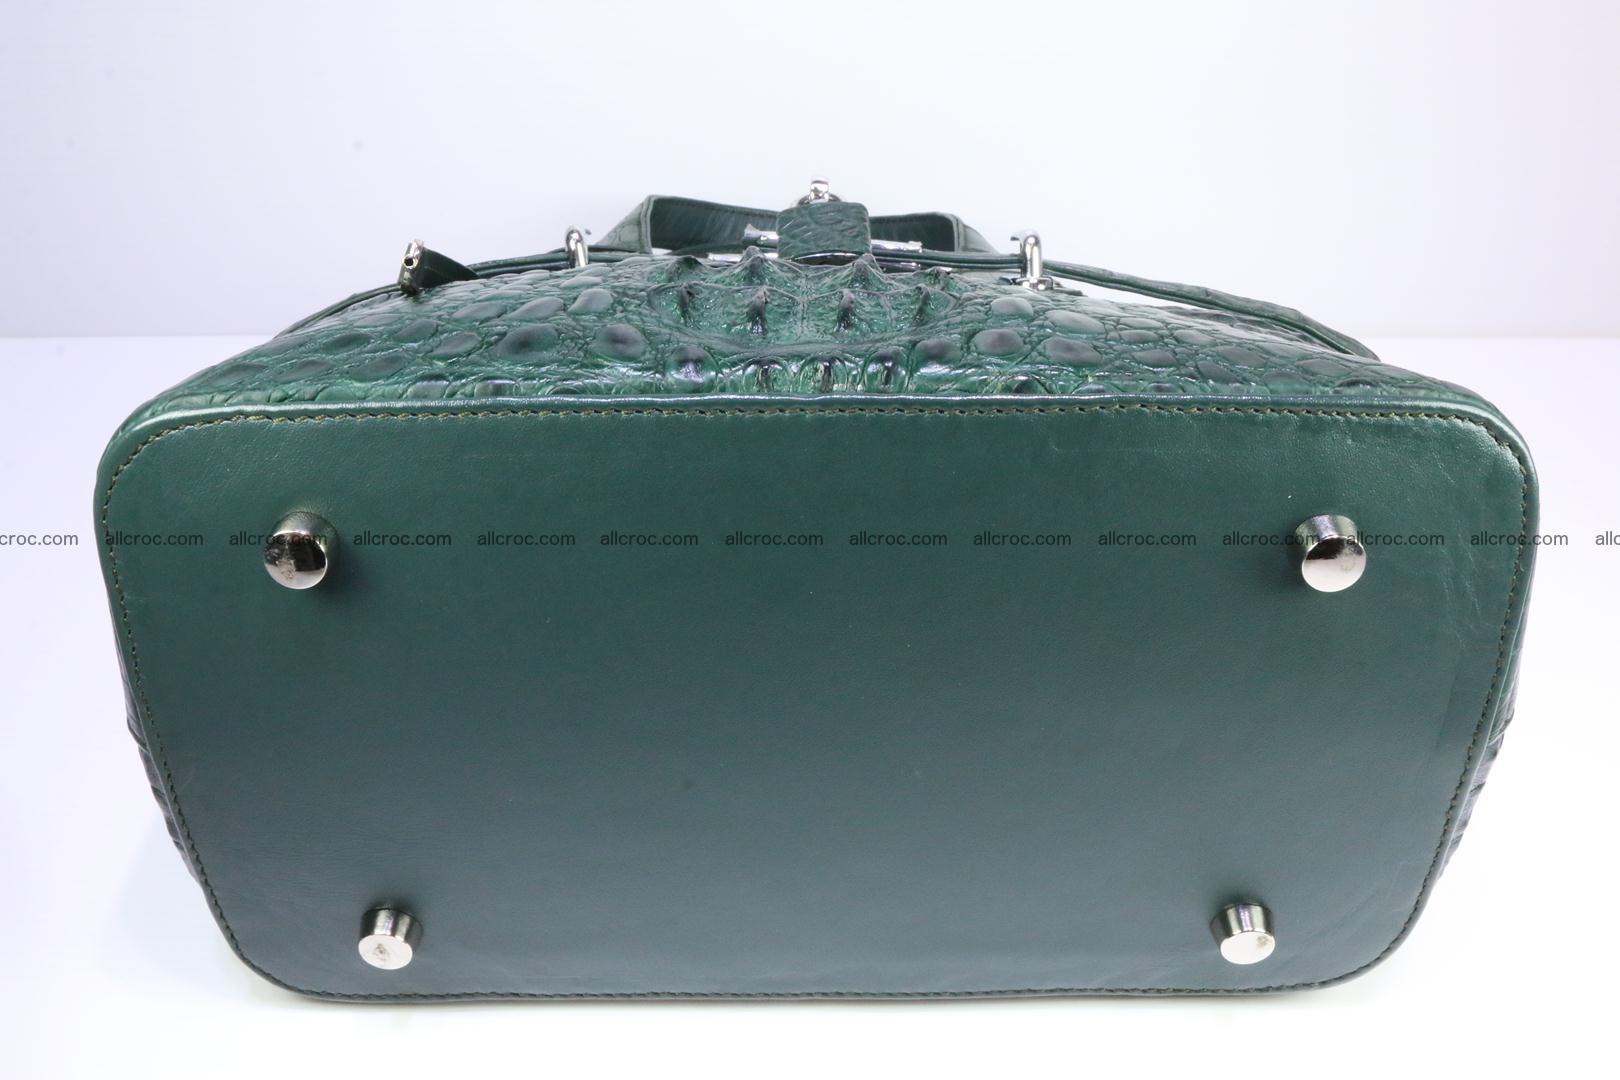 Genuine crocodile handbag for ladies 047 Foto 10